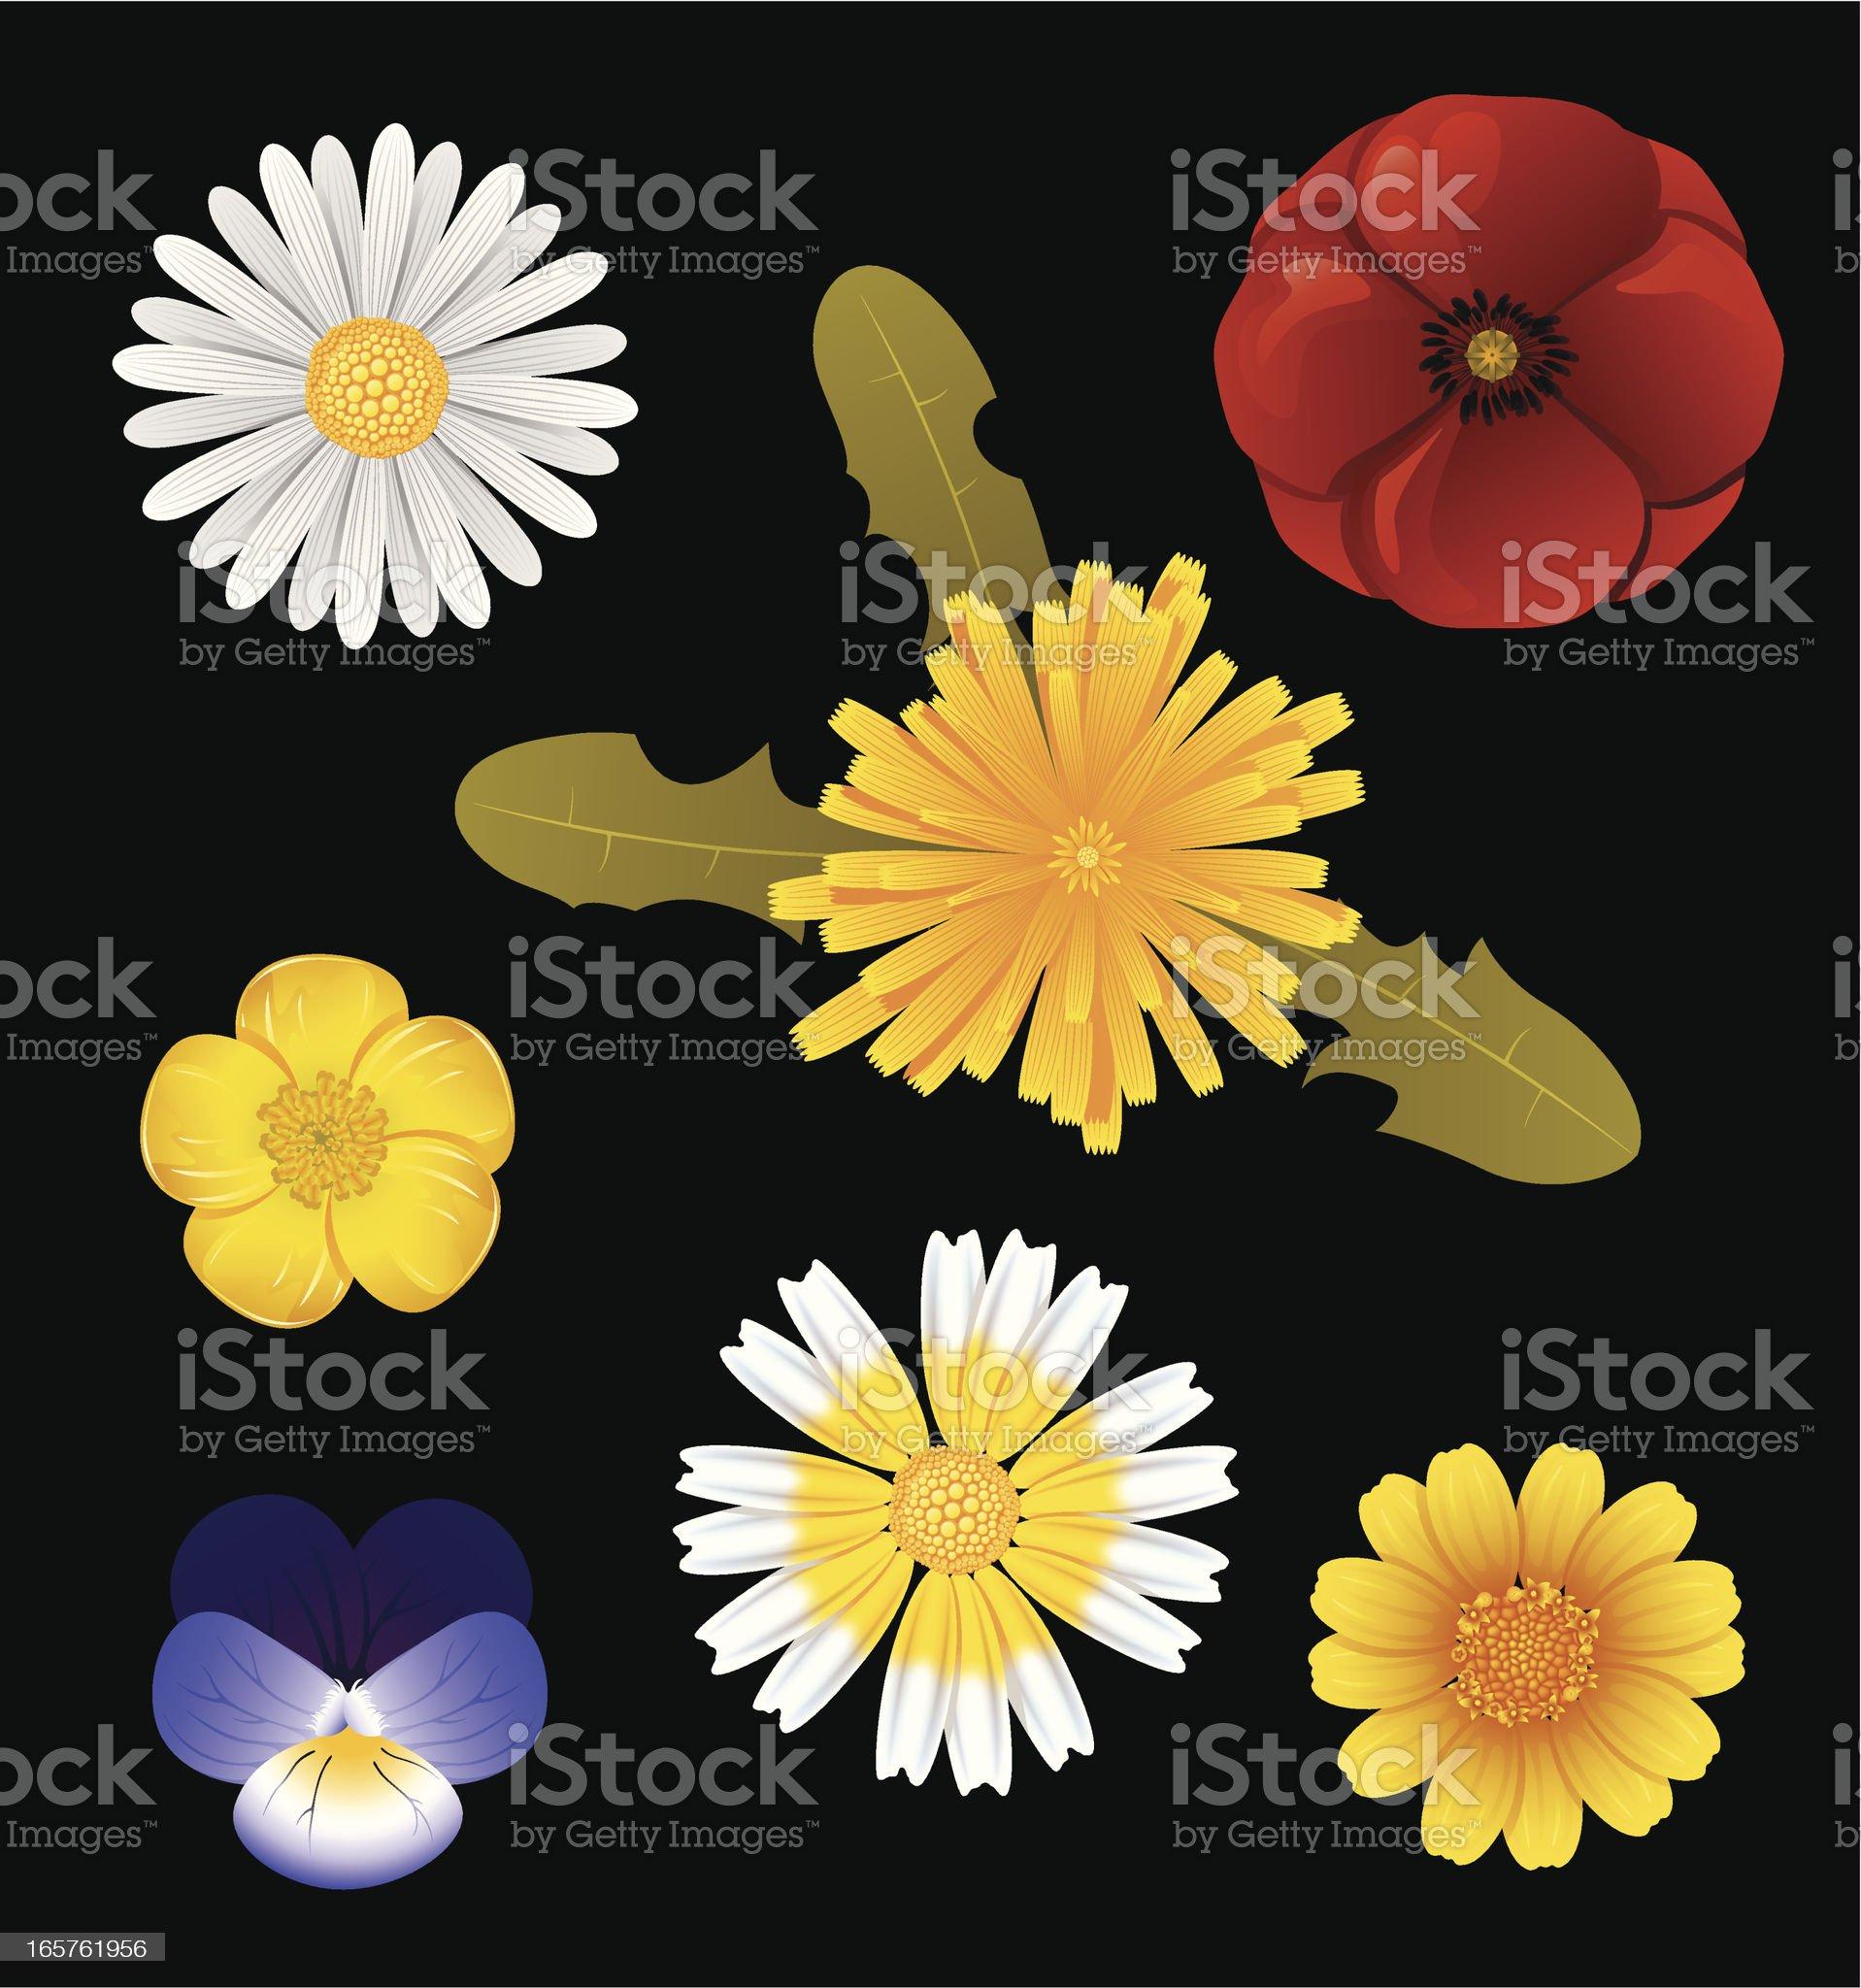 Wildflowers royalty-free stock vector art